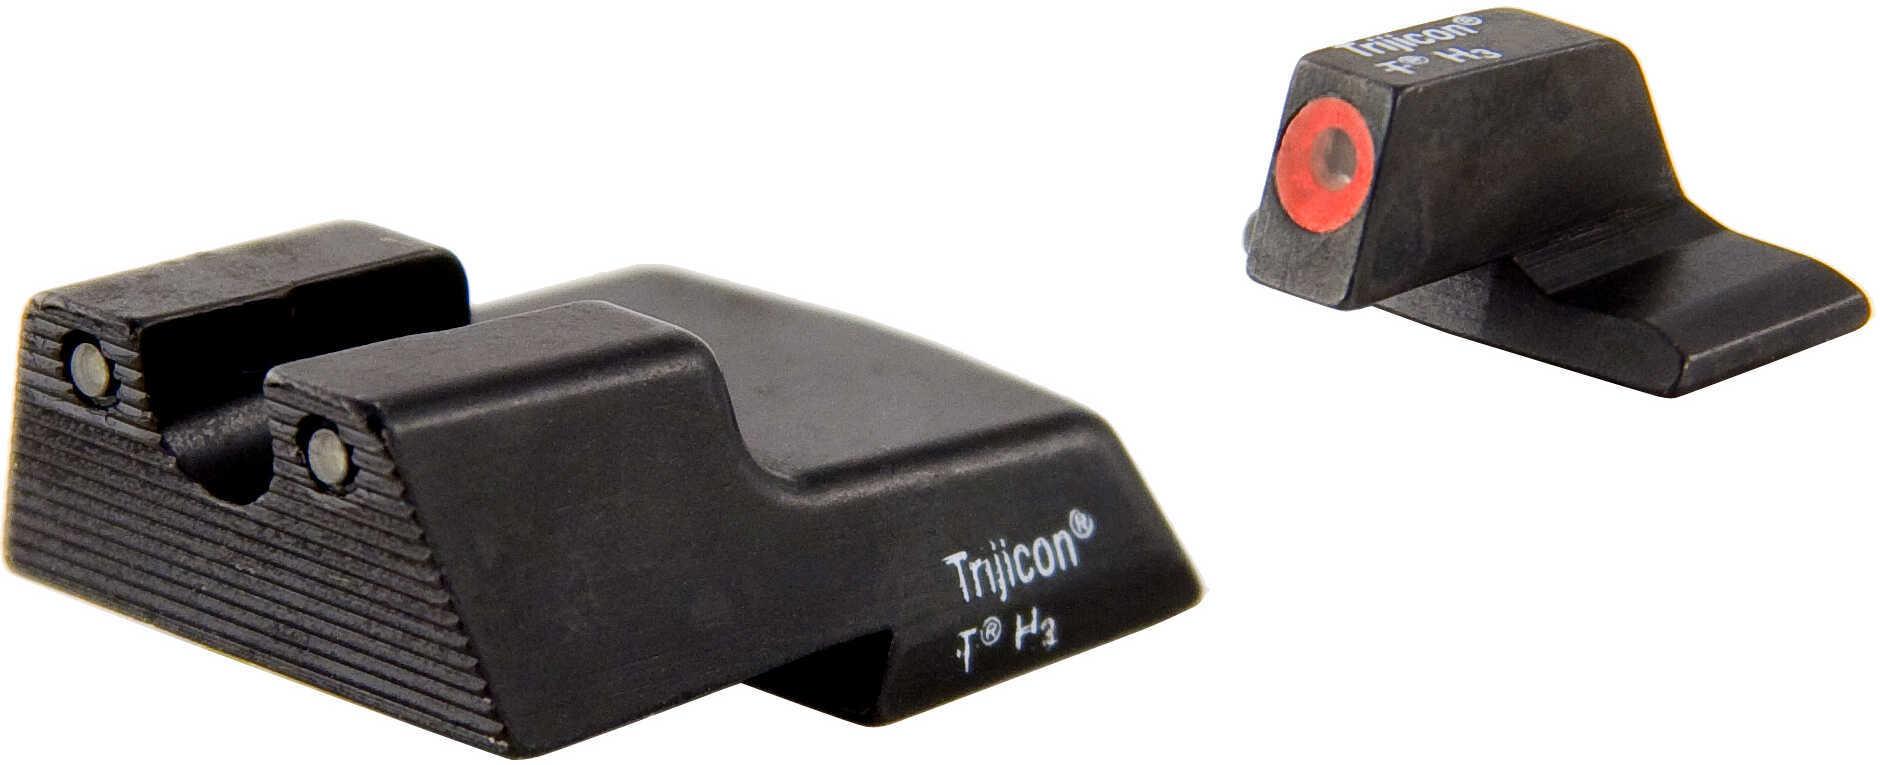 Trijicon HD Night Sight Set Grn/Orange Outline HK P30/Vp9